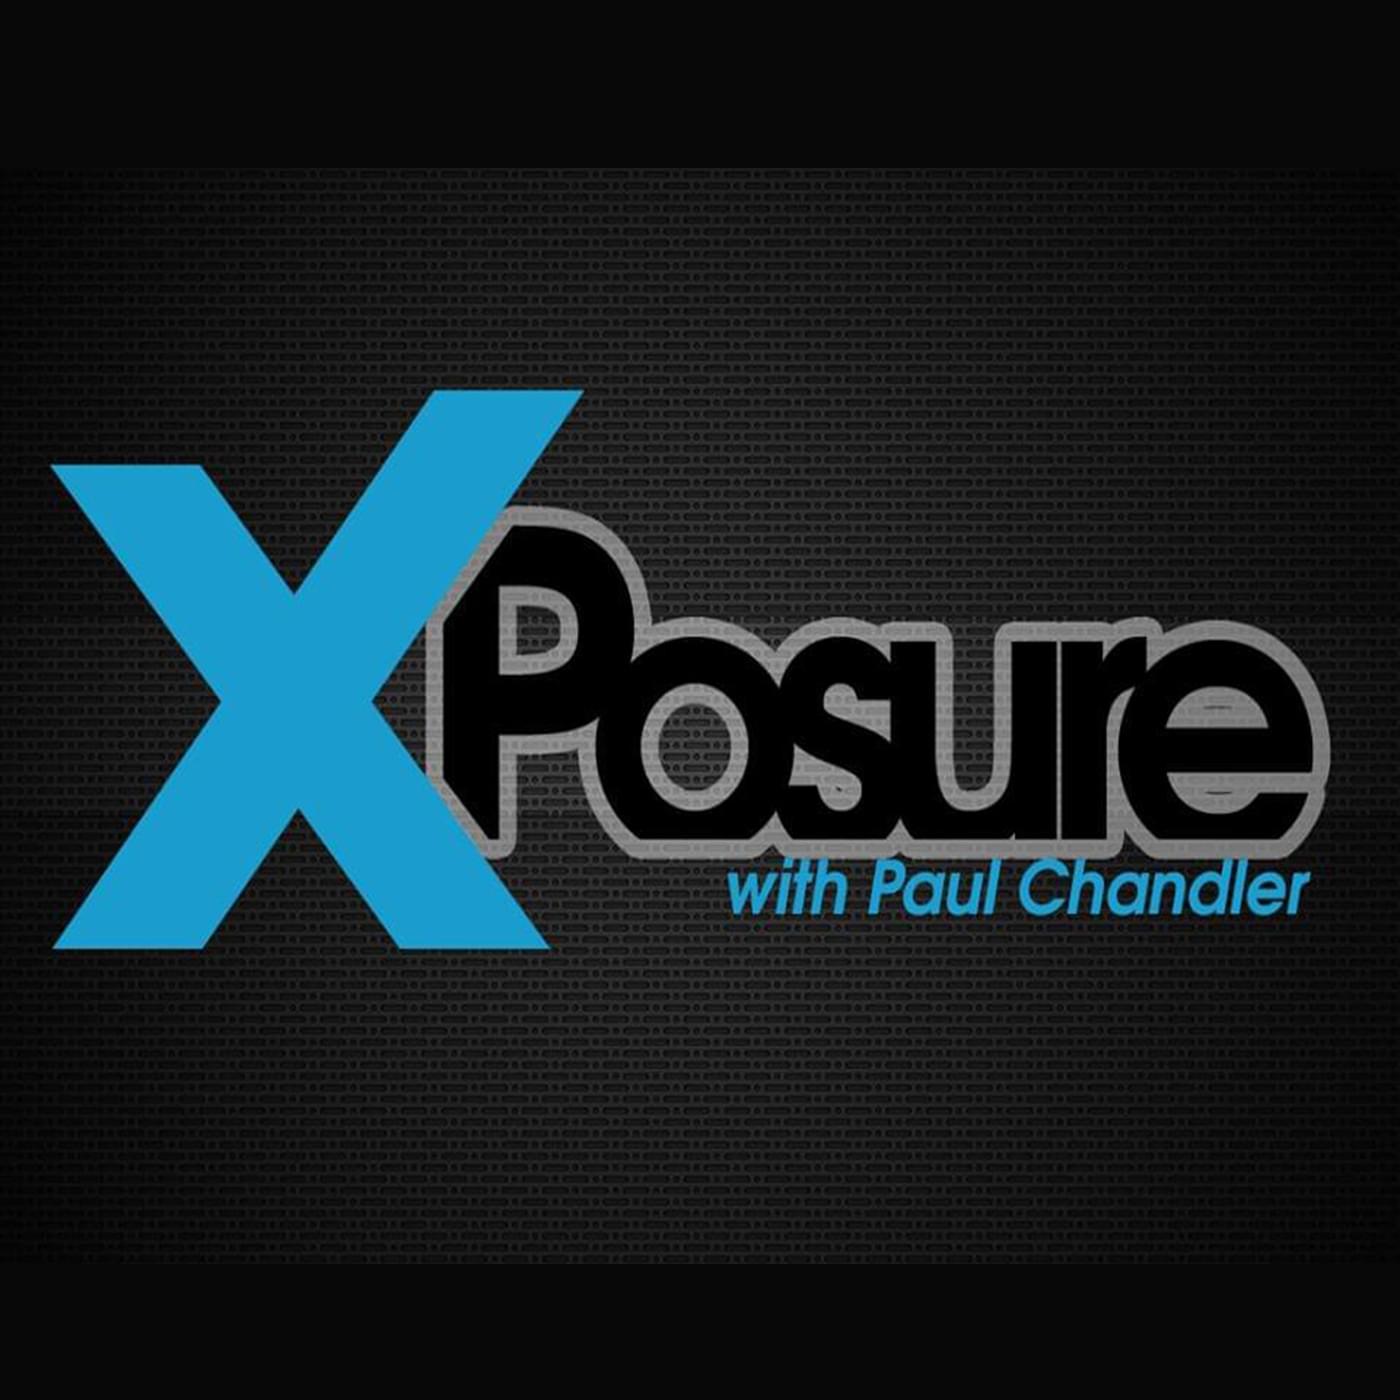 Xposure Playlist // 09.22.19